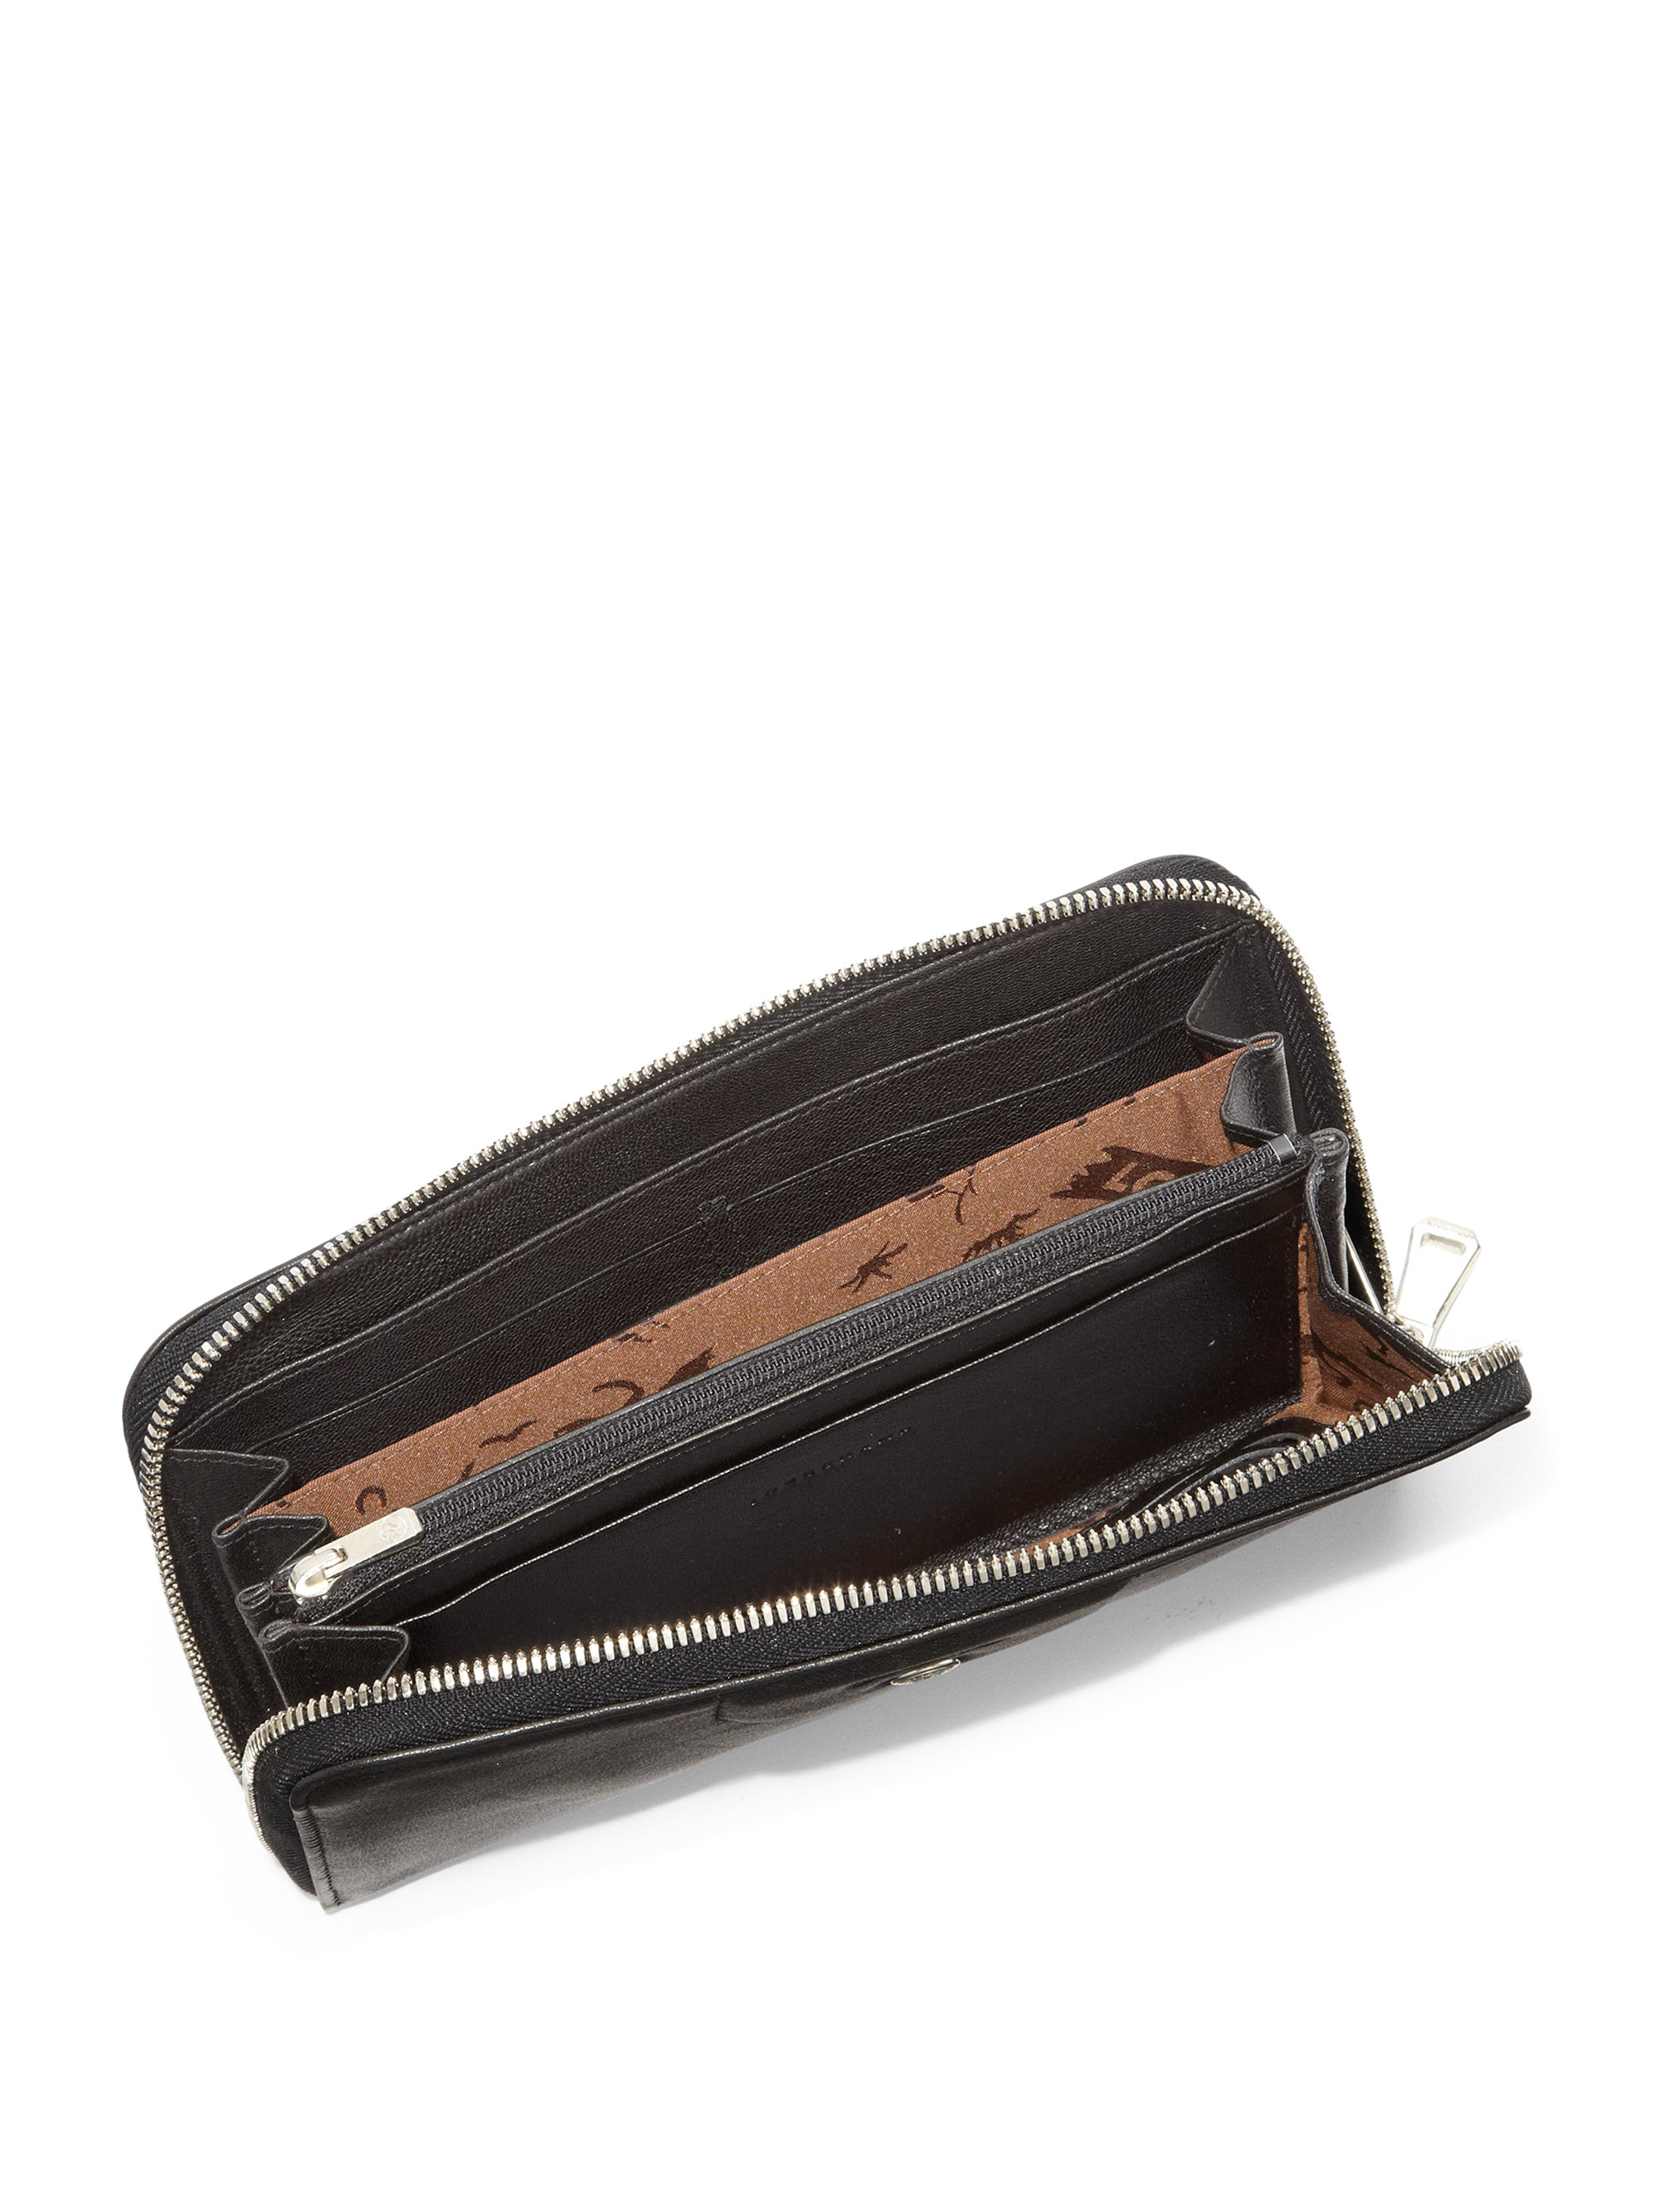 fd042b0a3a Longchamp Le Pliage Cuir Zip-Around Wallet in Black - Lyst